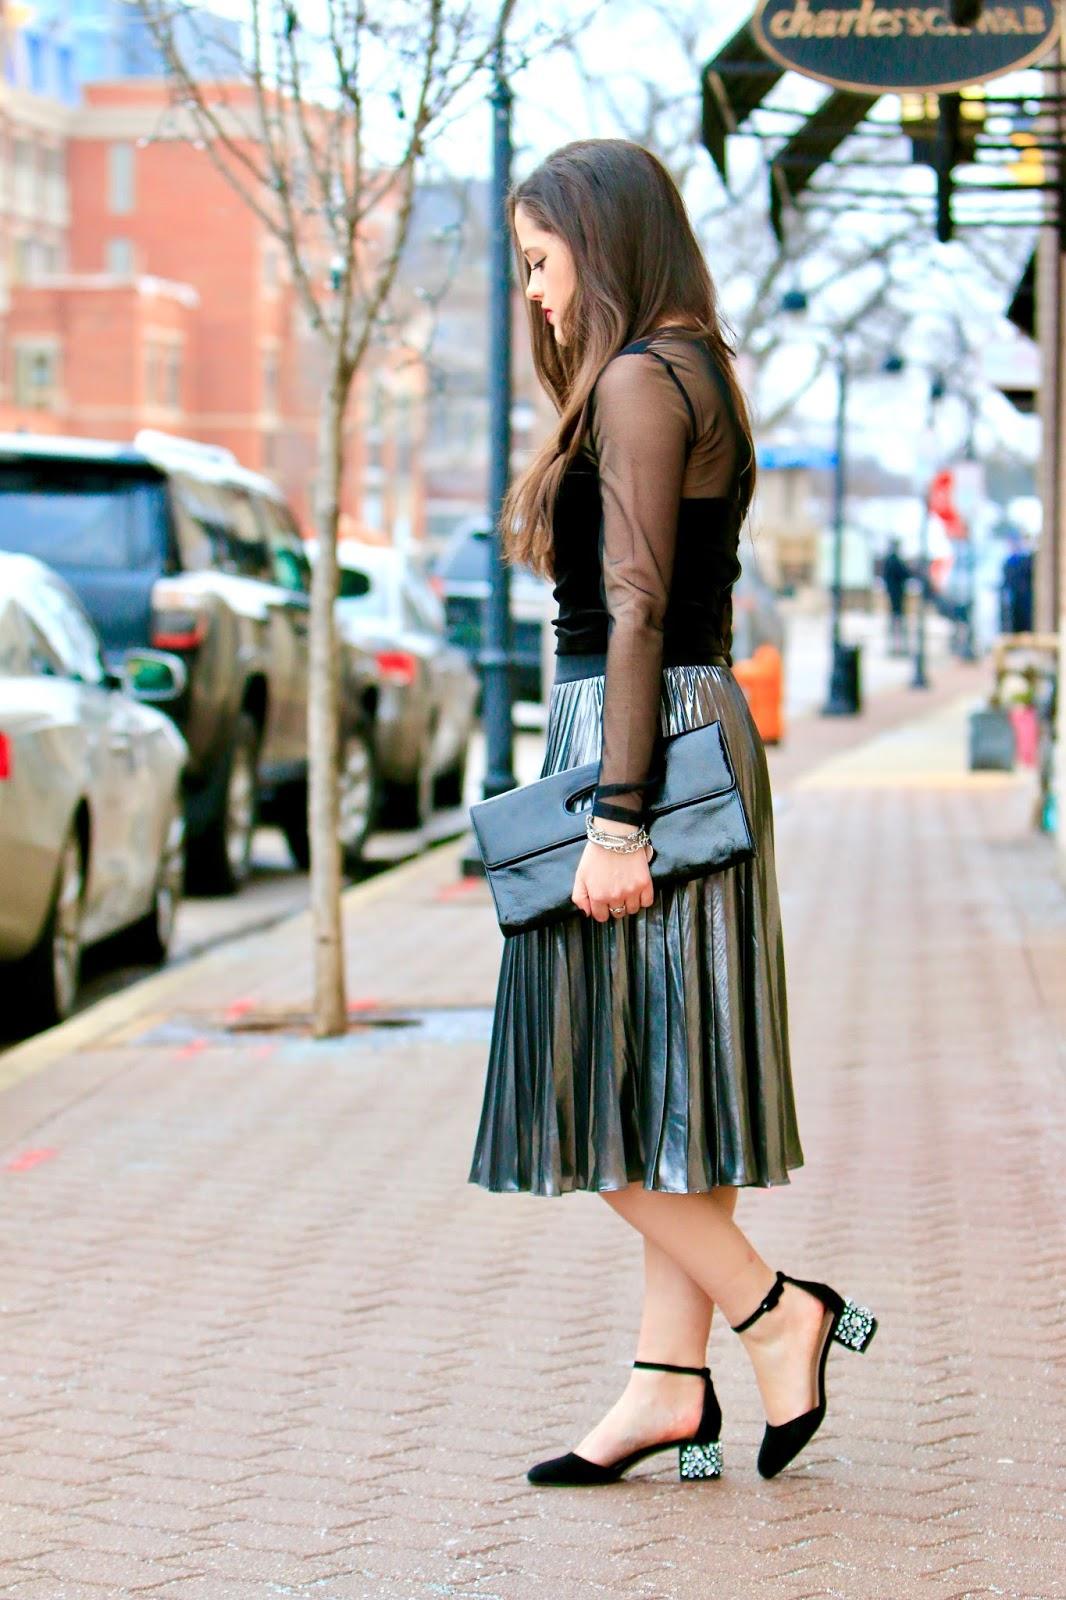 how to wear metallic skirt pics